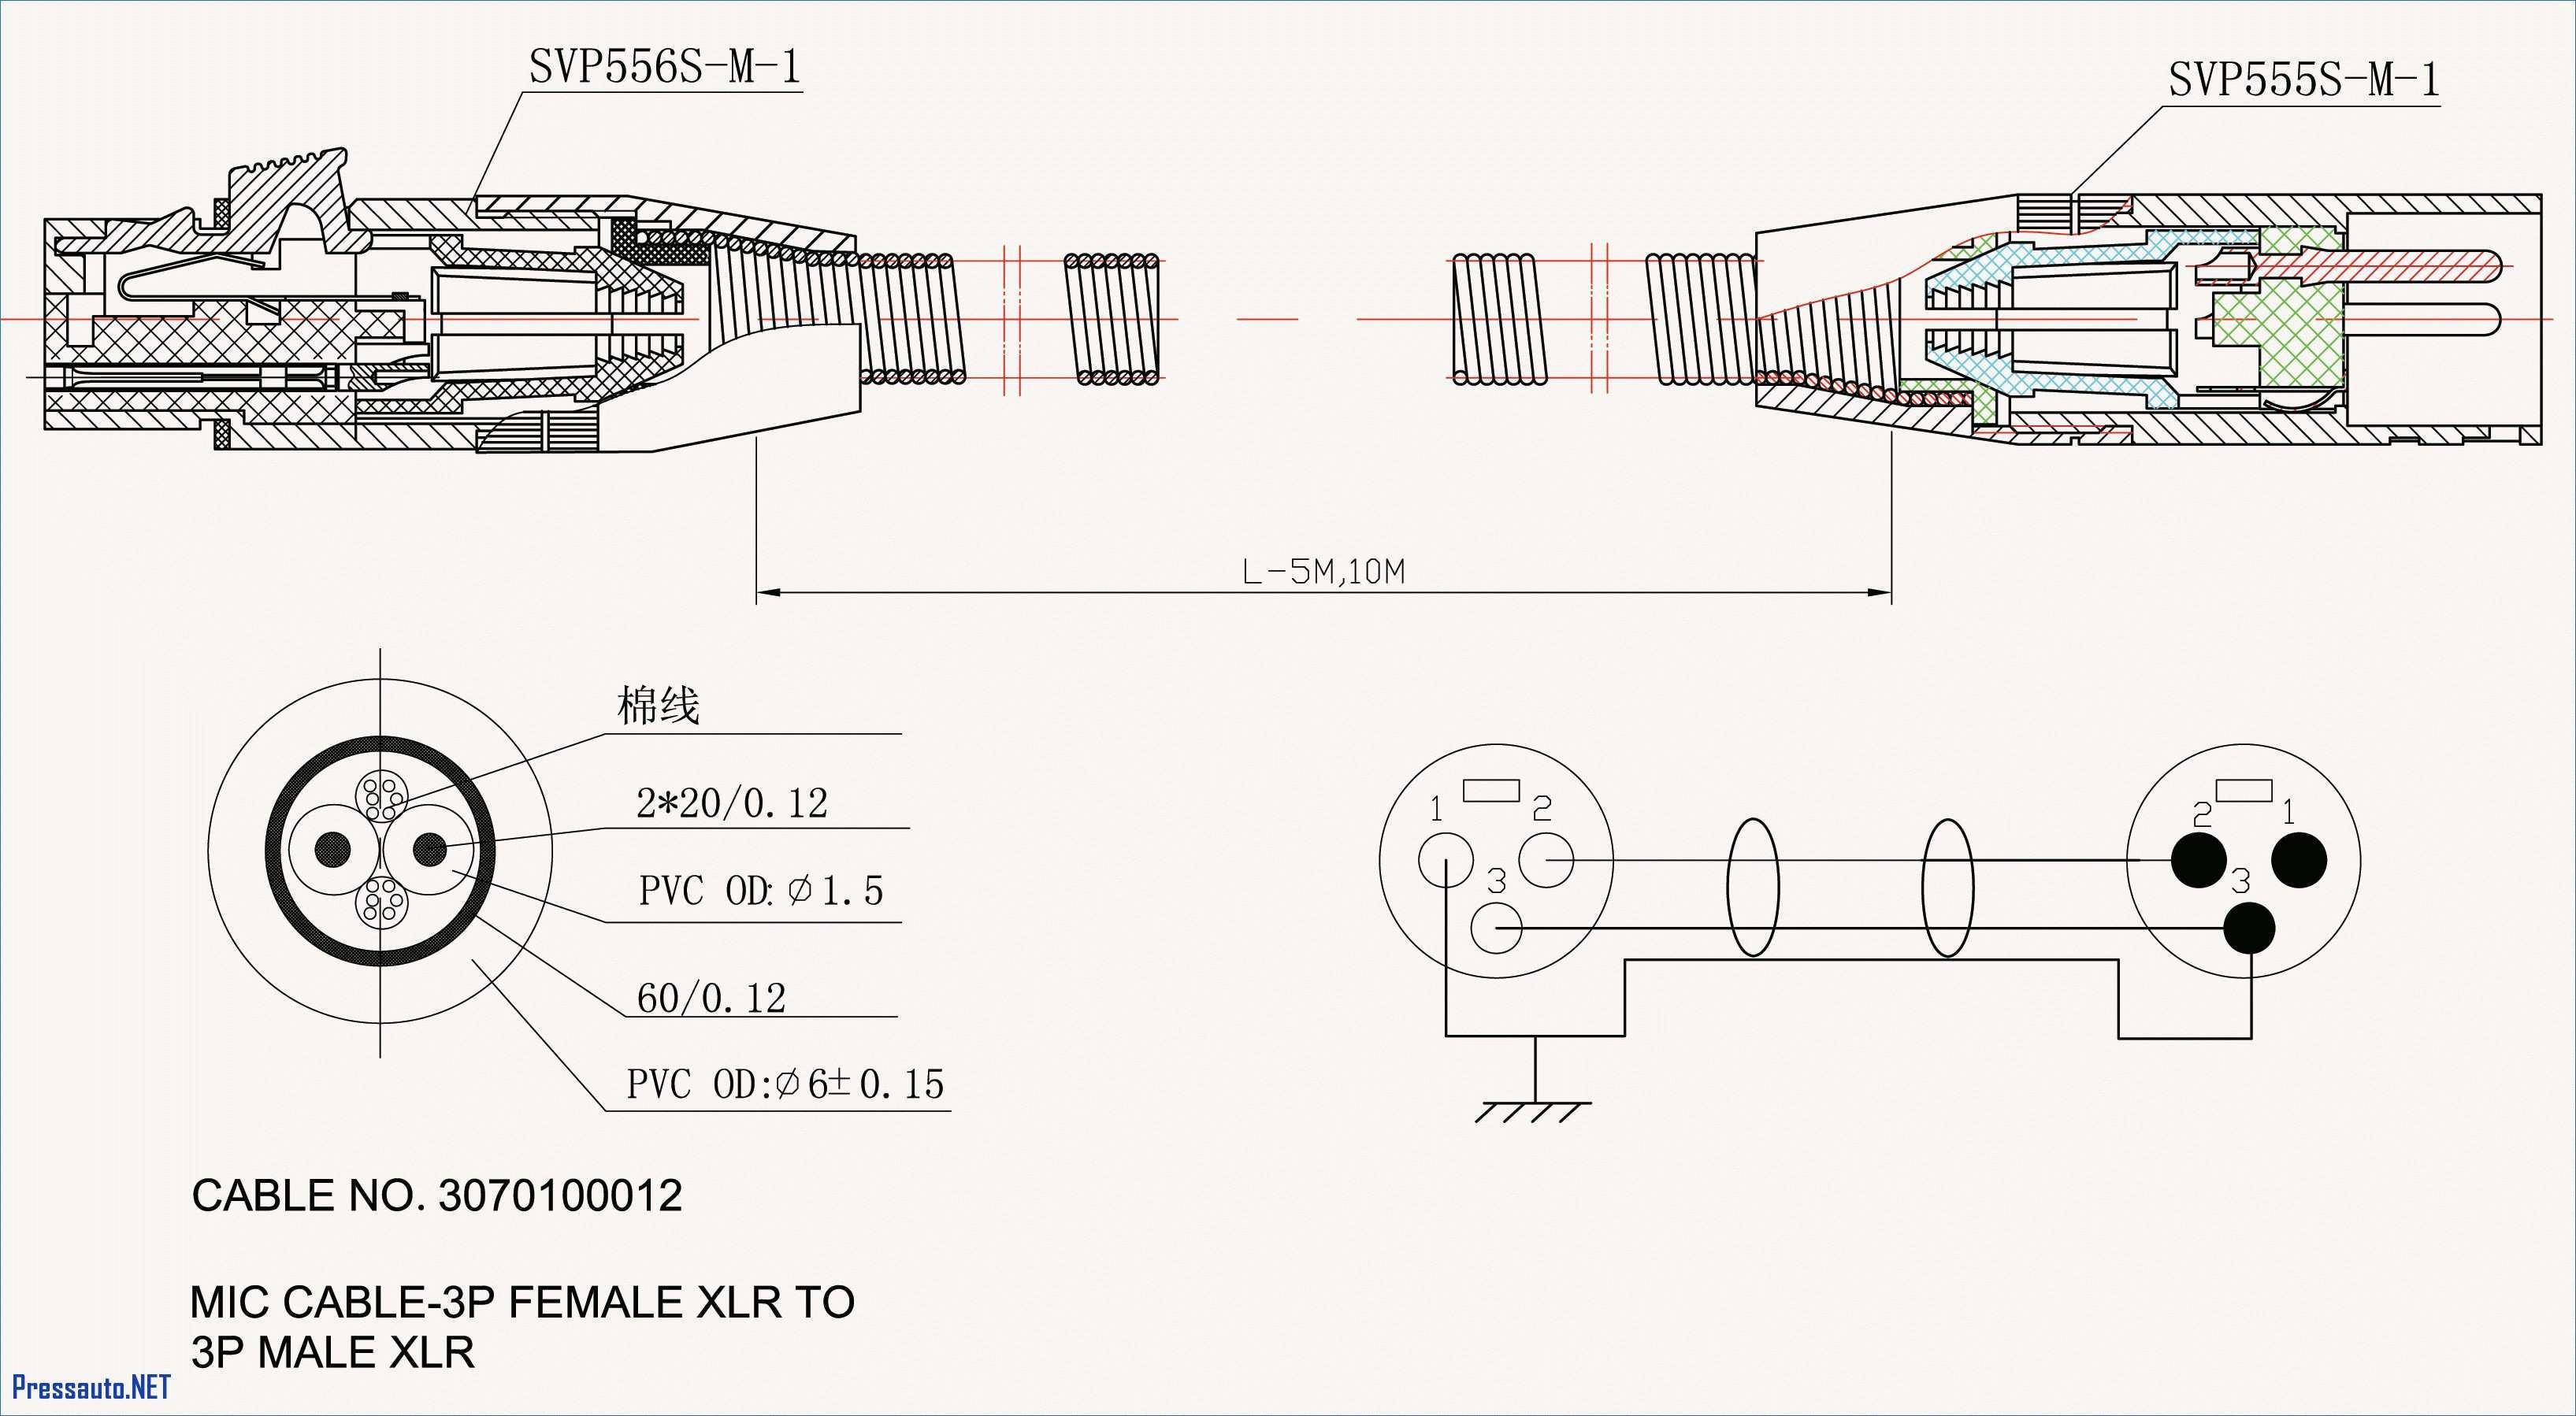 Travel Trailer Wiring Diagram Best Of Travel Trailer Brake Wiring - Travel Trailer Wiring Diagram